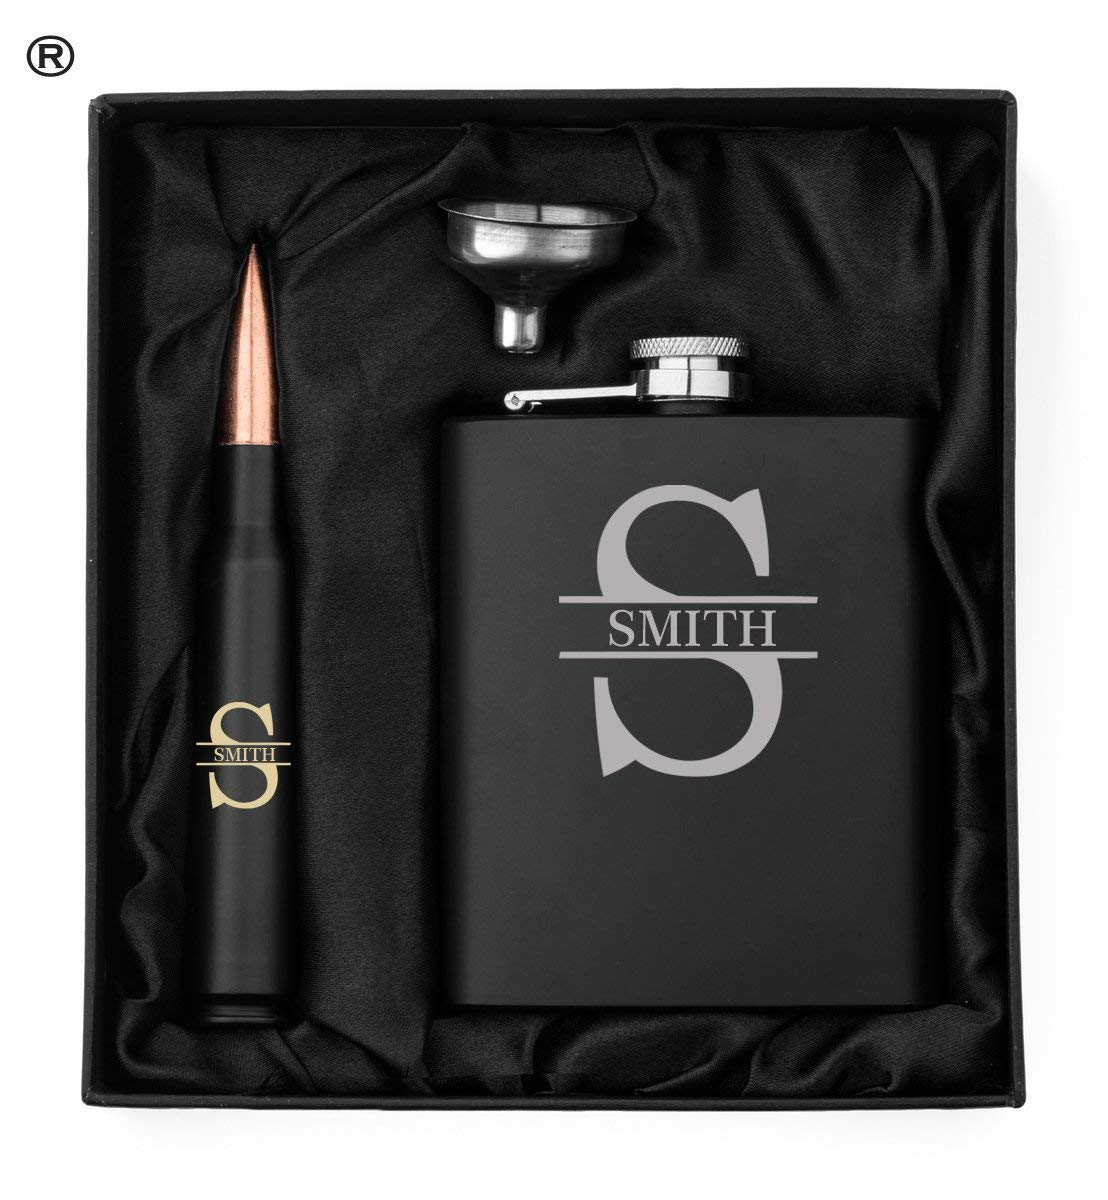 Monogram Initial Engraved Hip Flask, Funnel and 50 Caliber Bullet Bottle Opener Matte Black Gift Box 50 Cal Custom Personalized